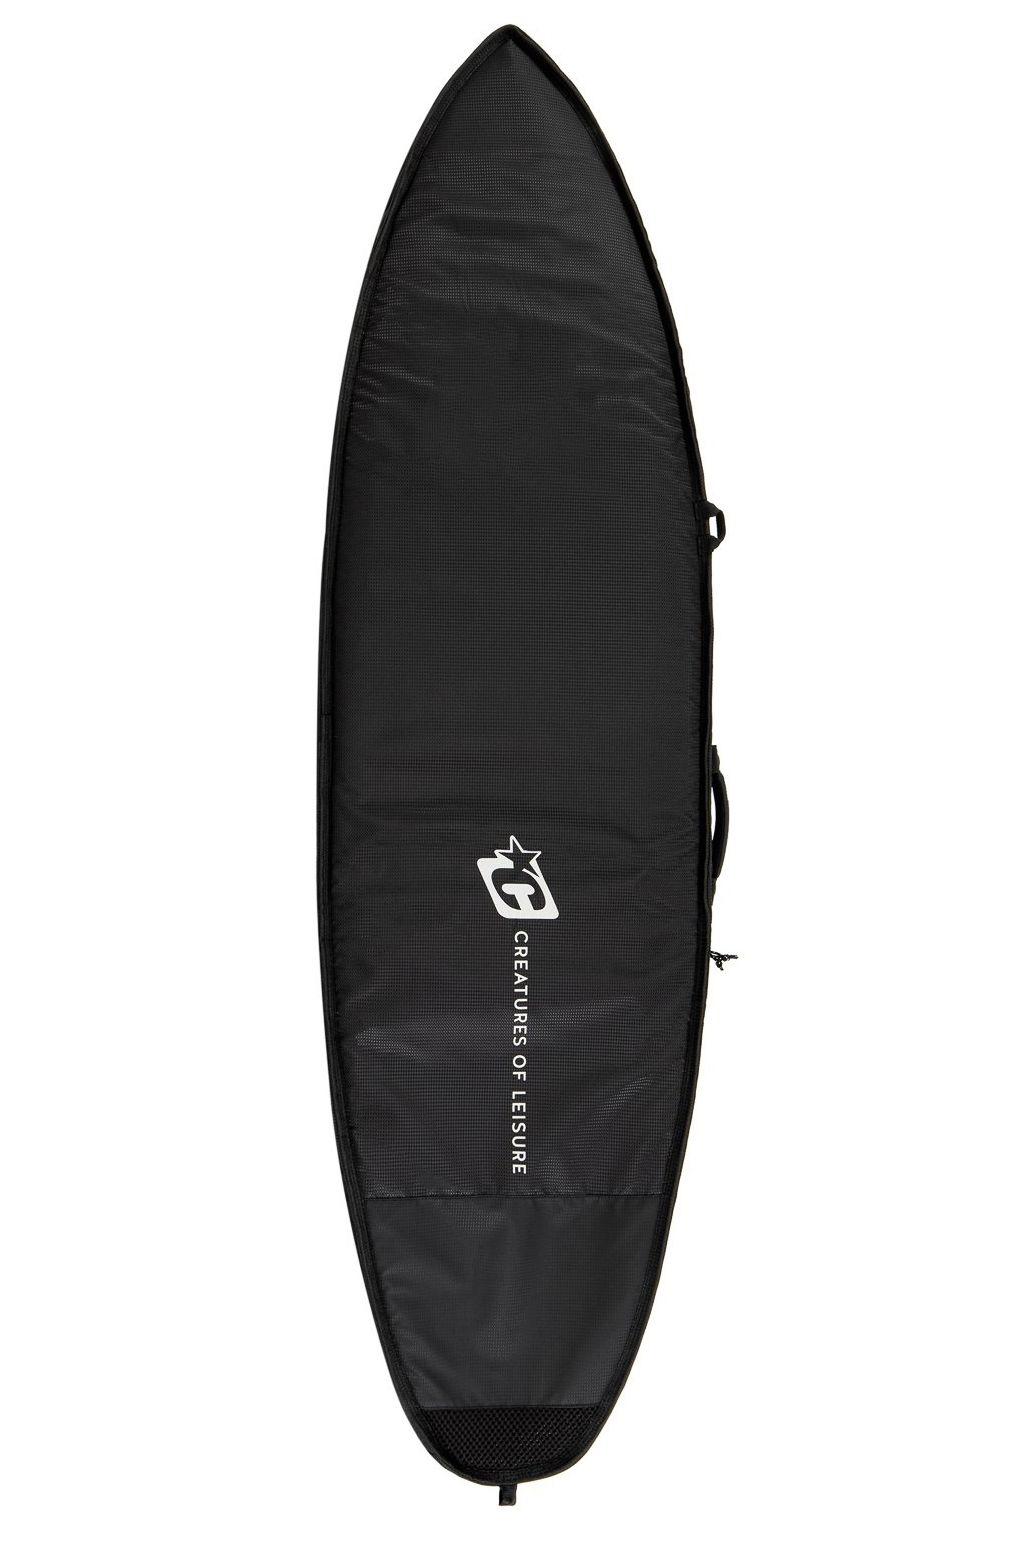 "Creatures Boardbag 6'0"" SHORTBOARD DAY USE Black Black"